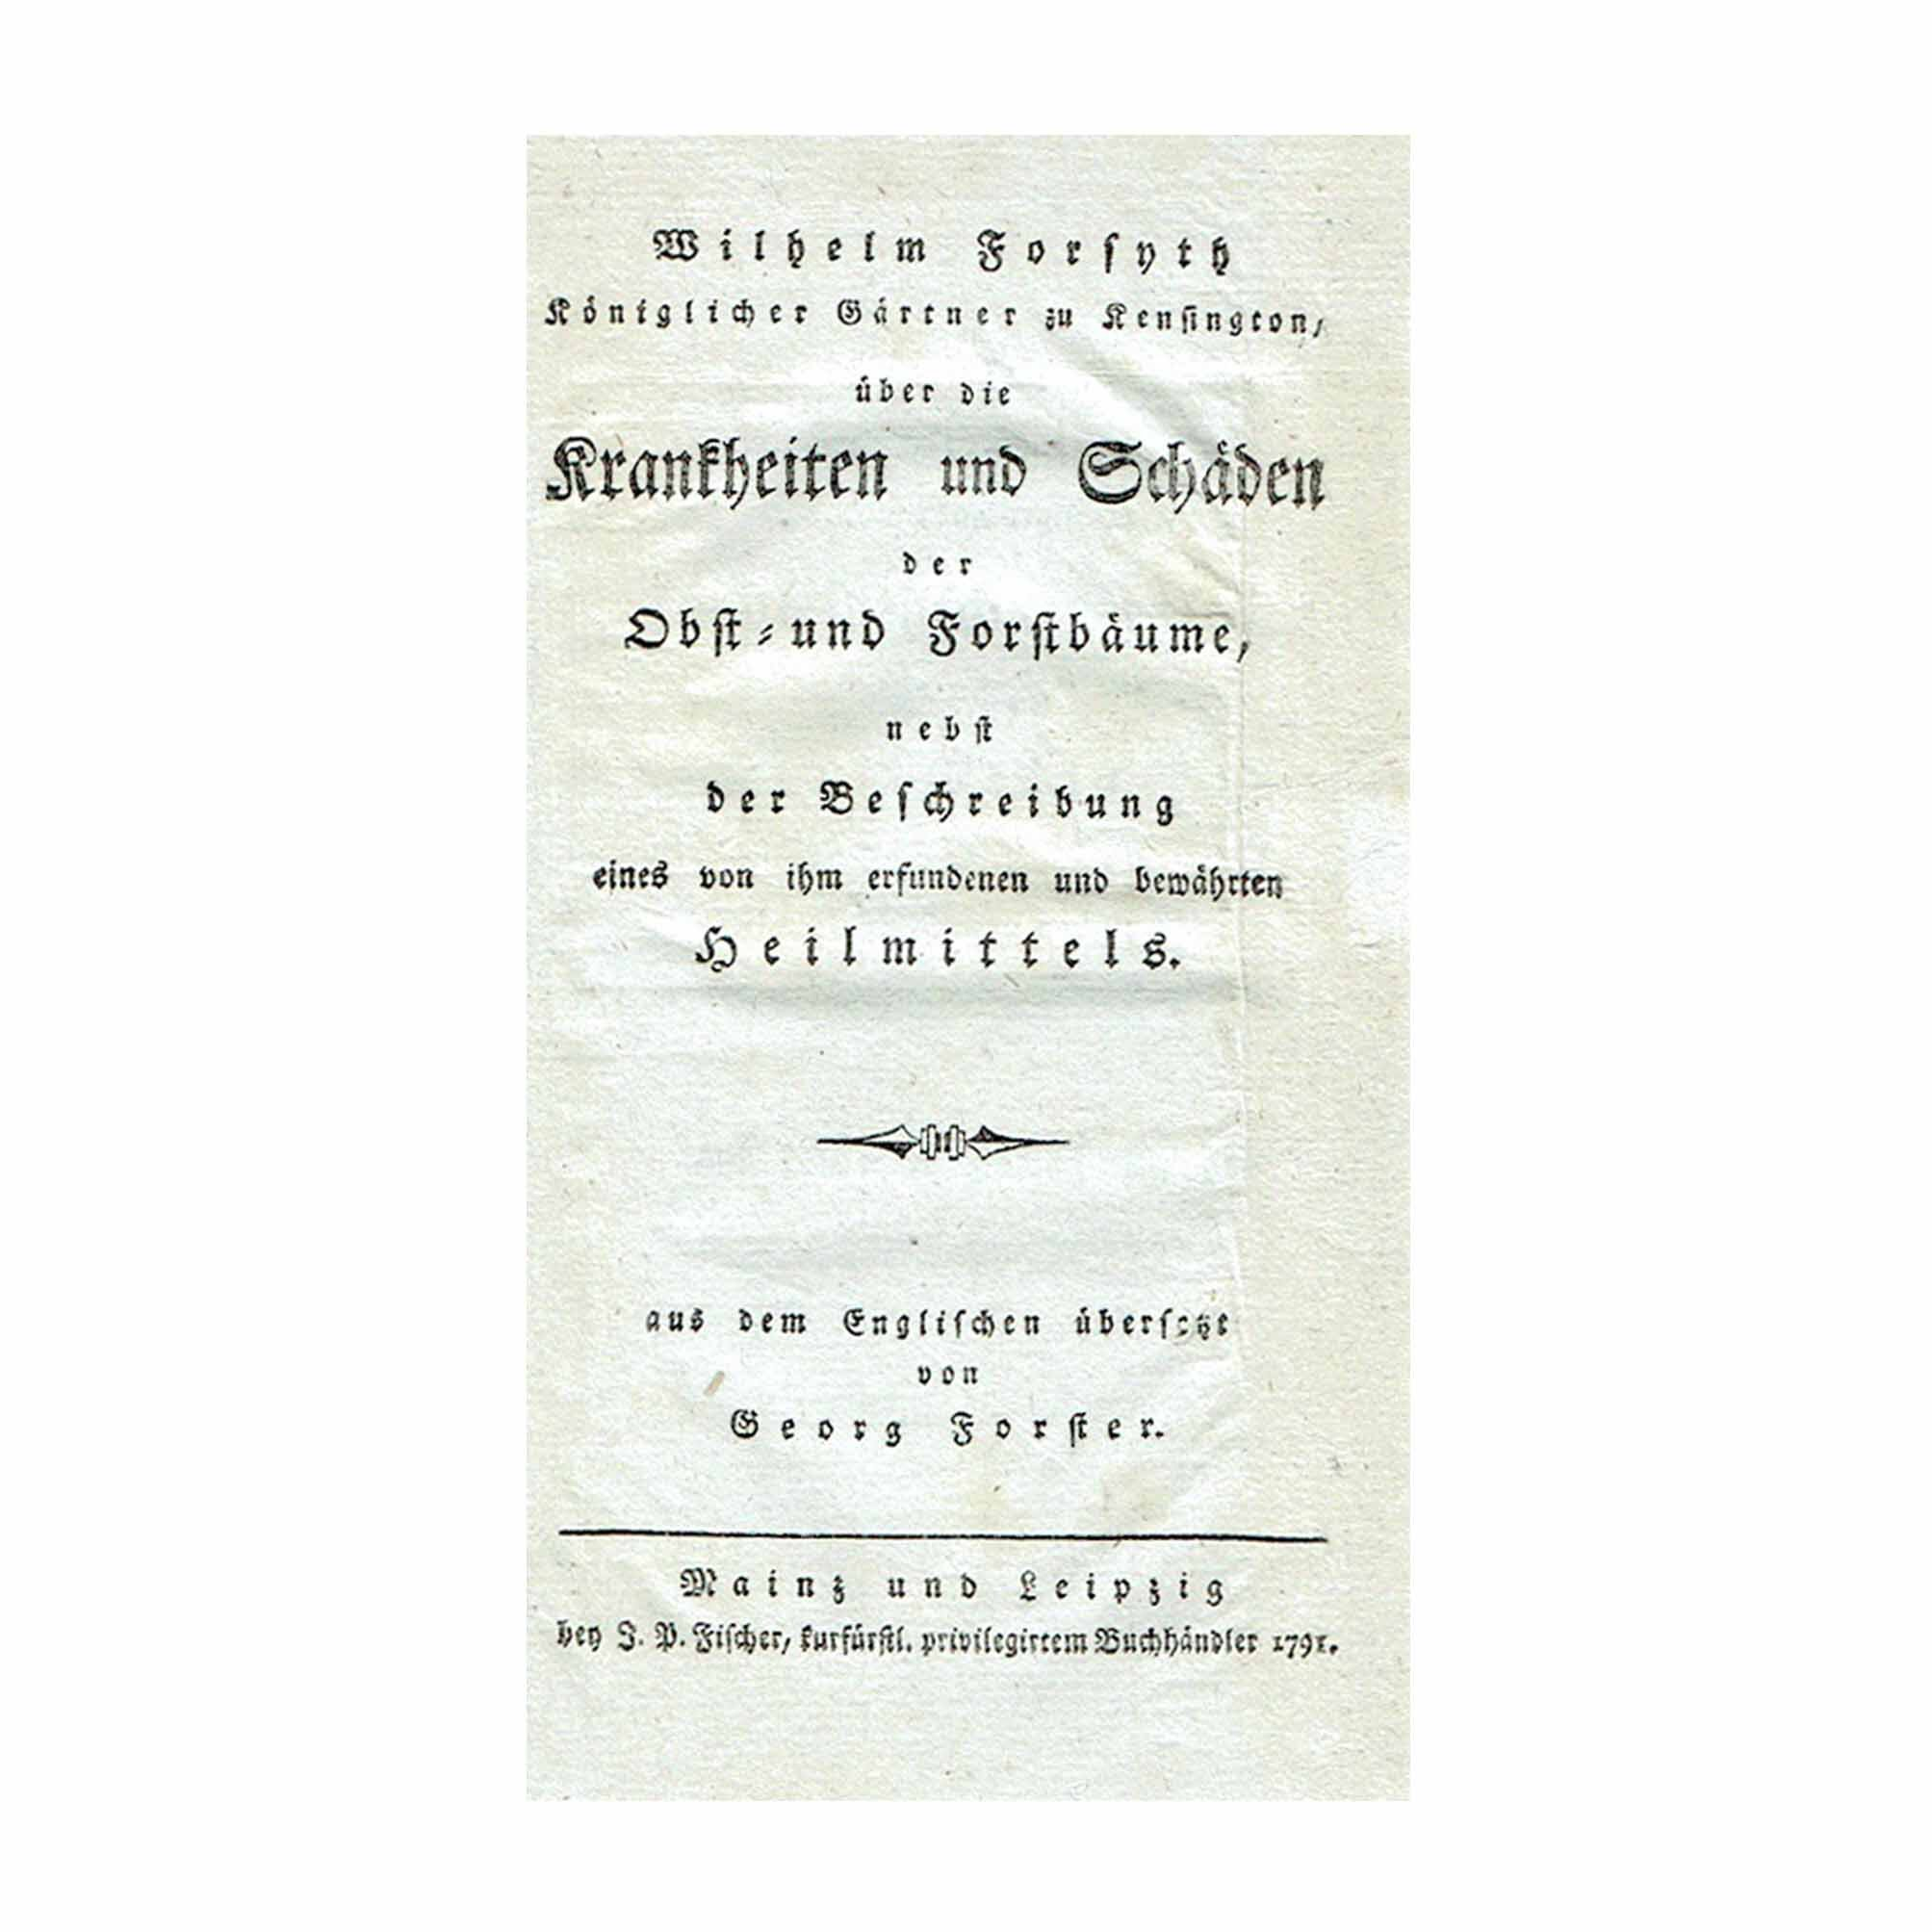 5792 Forsyth Forster Bäume 1791 Titelblatt A N